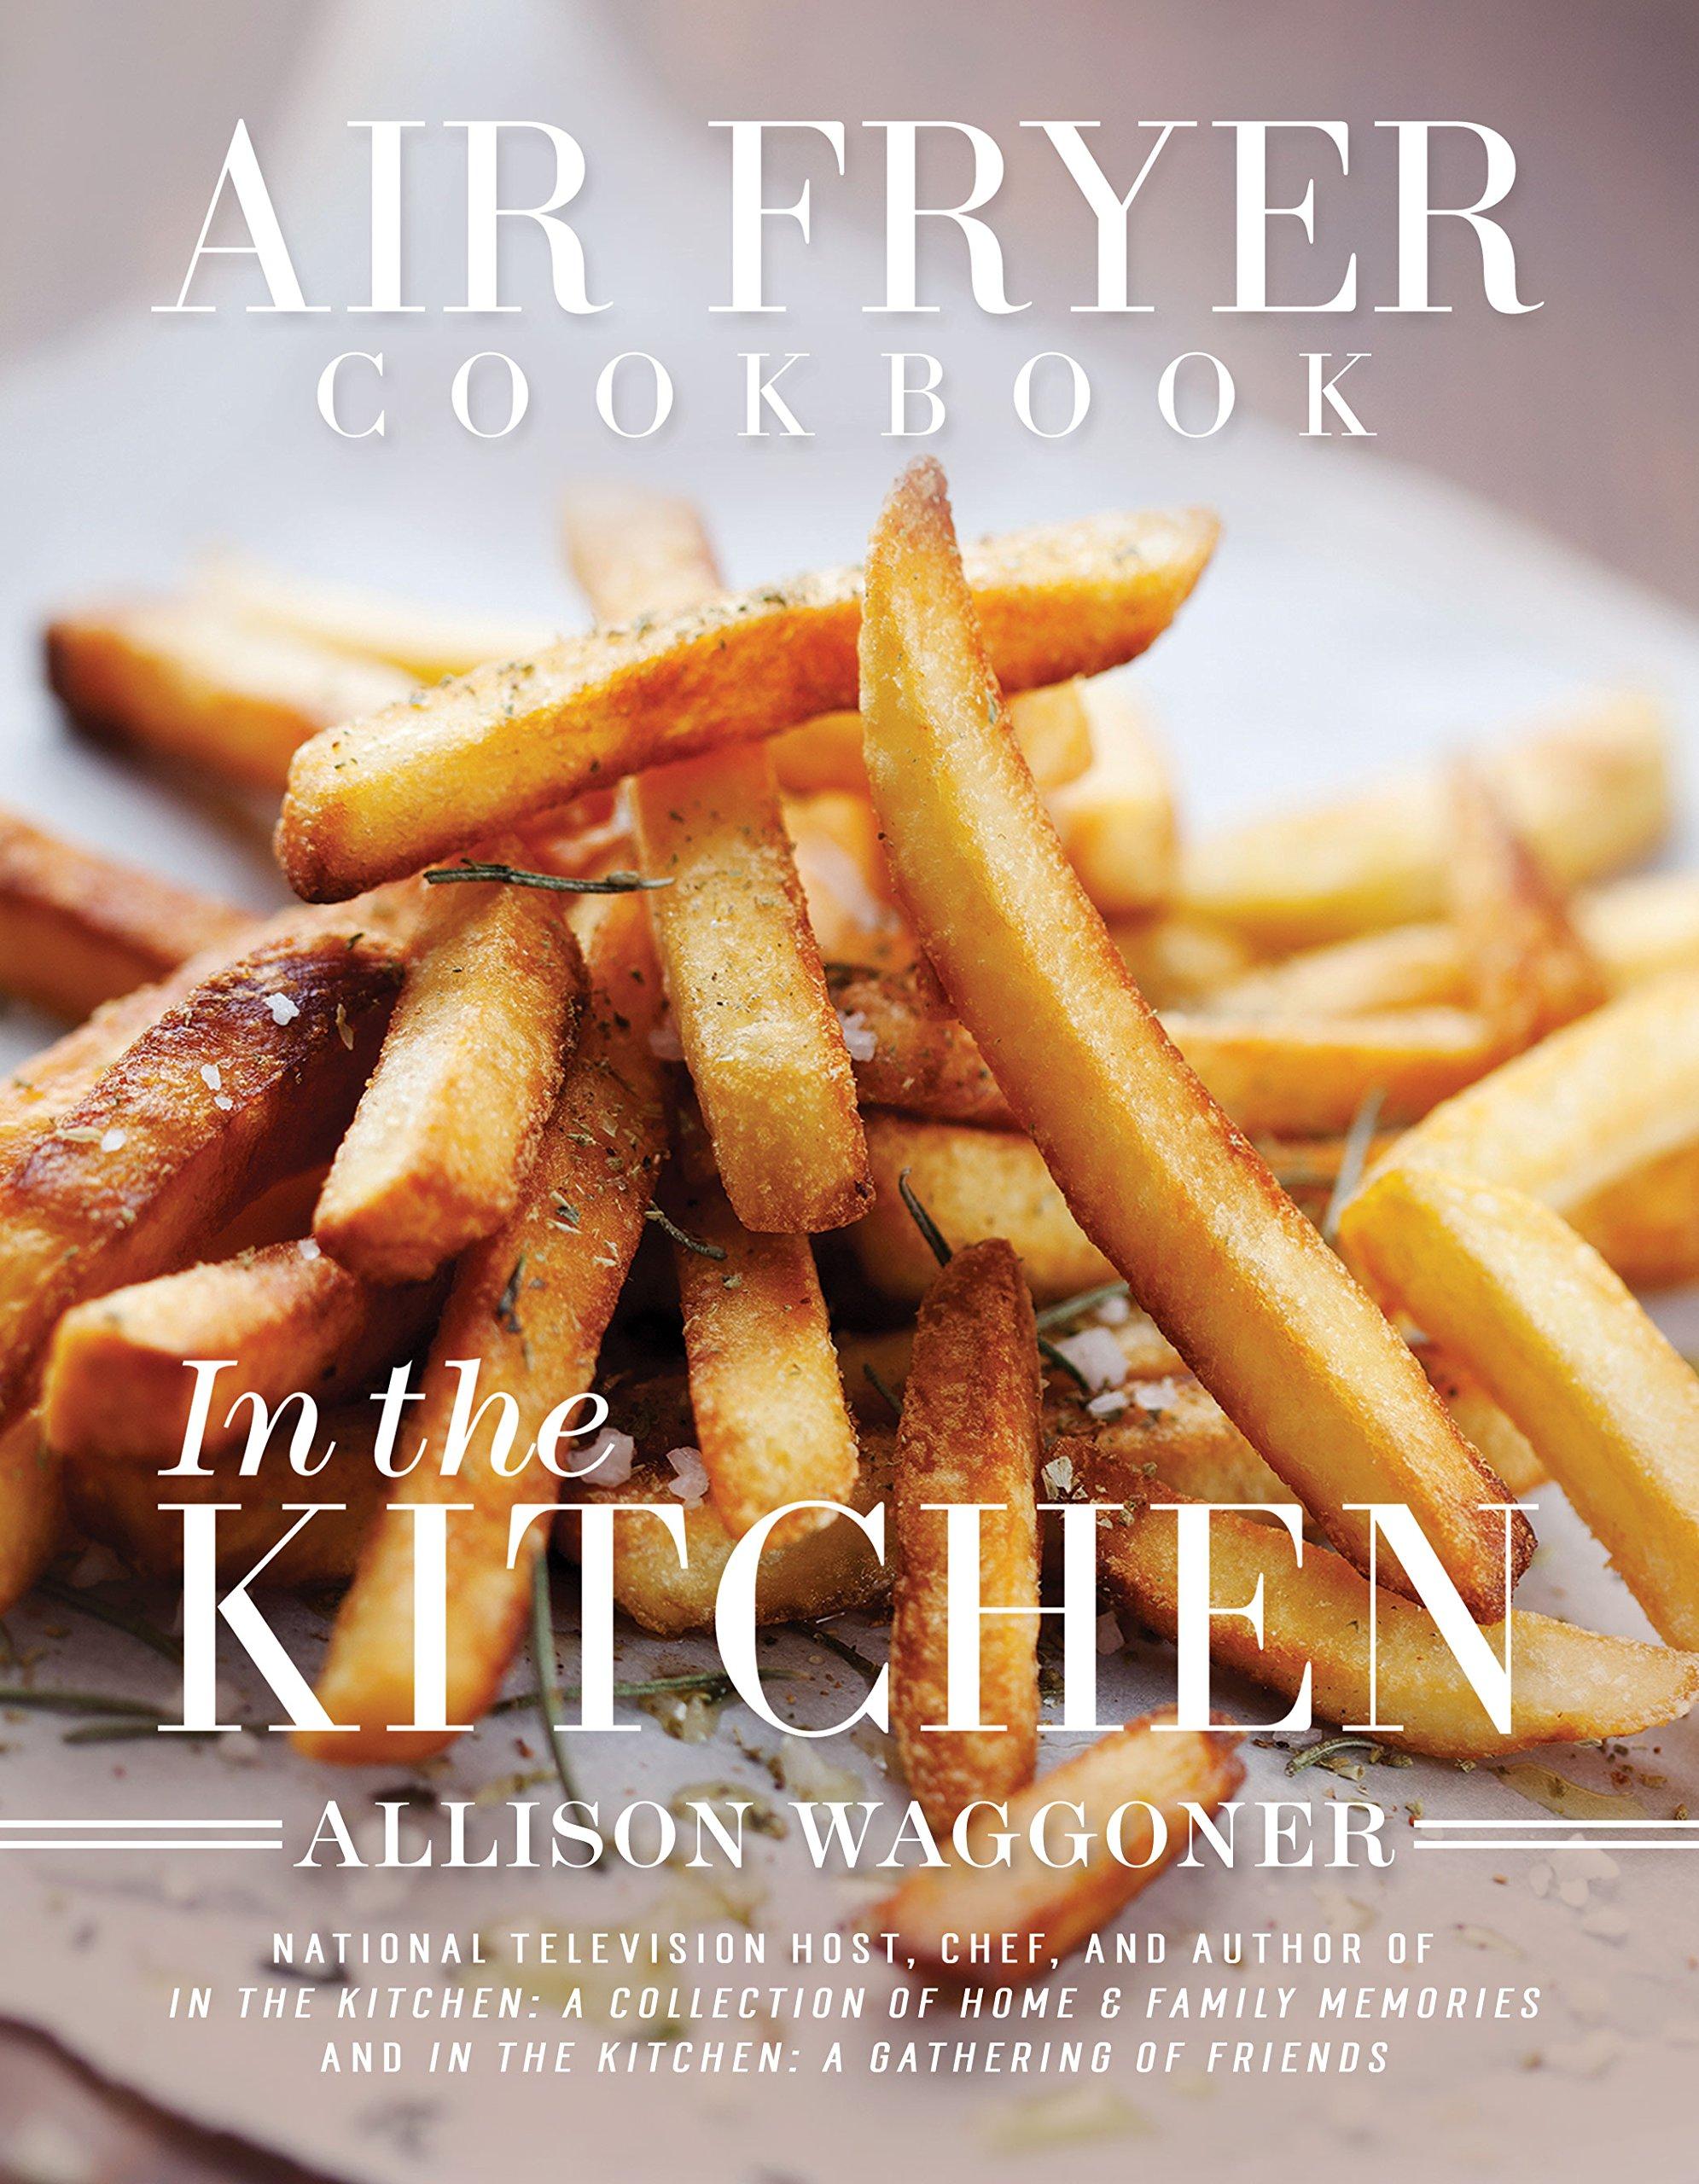 Air fryer cookbook in the kitchen new edition amazon air fryer cookbook in the kitchen new edition amazon allison waggoner 9781462118090 books forumfinder Gallery